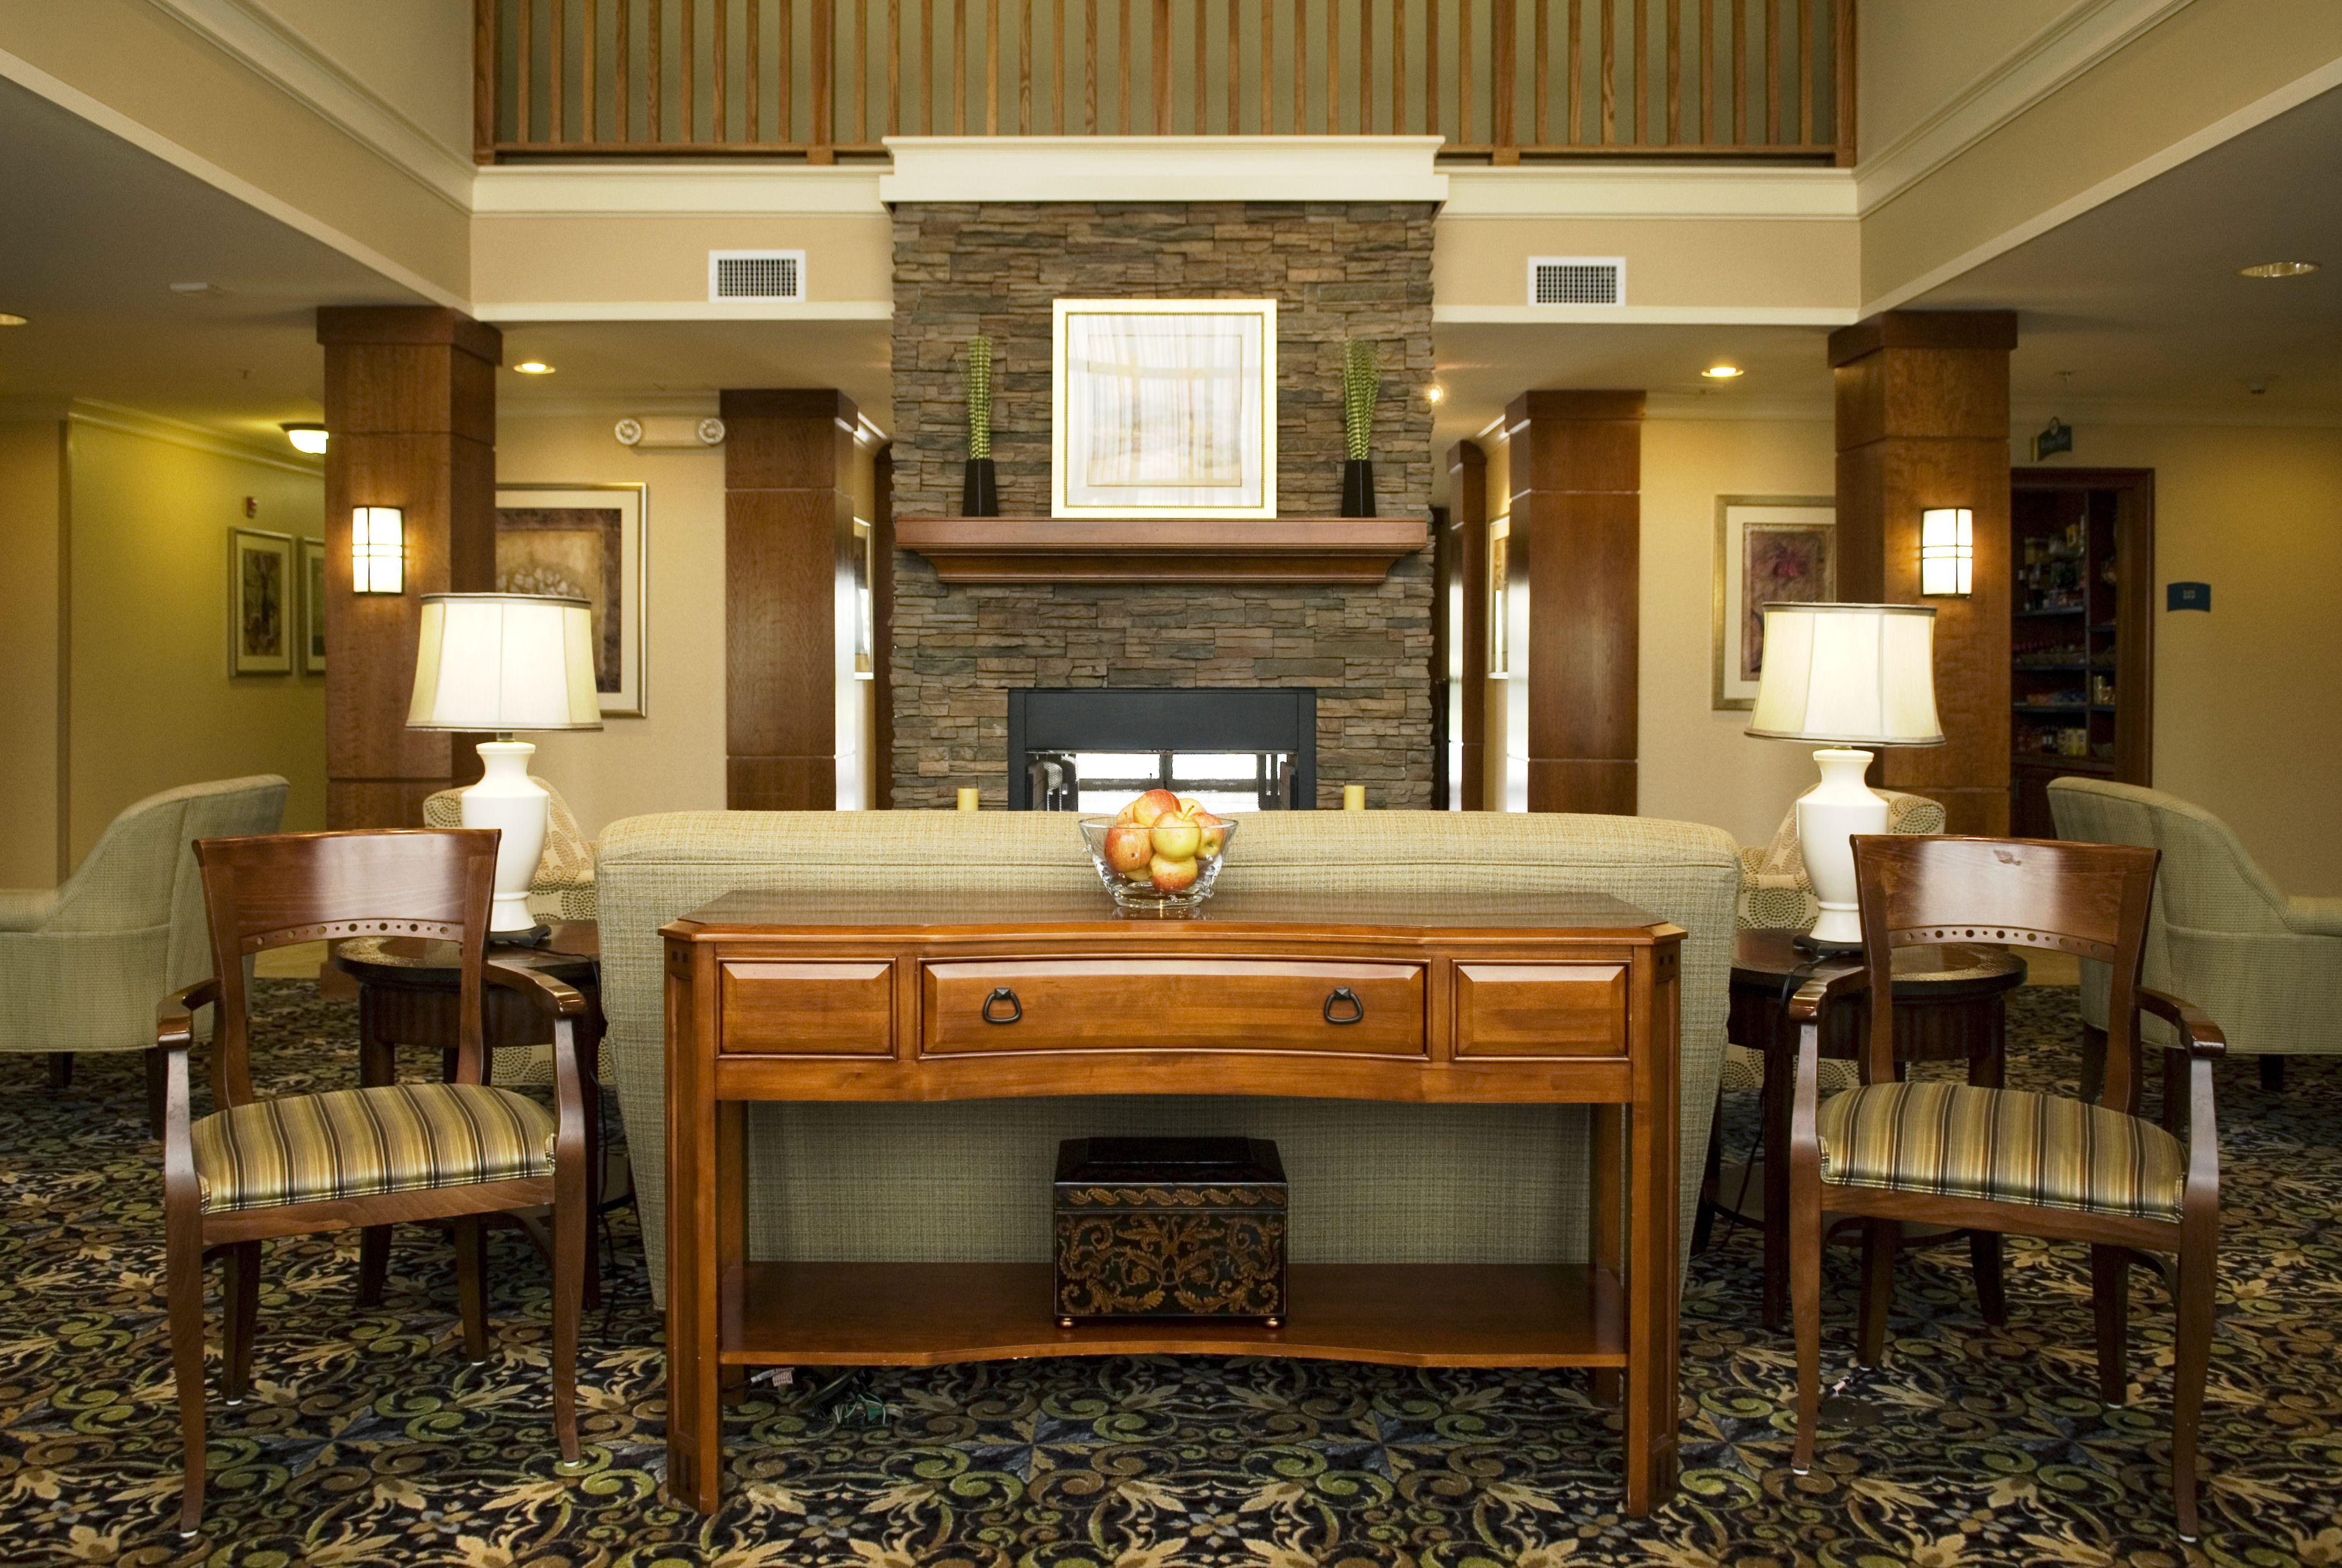 Staybridge Suites Savannah Airport - Pooler image 4